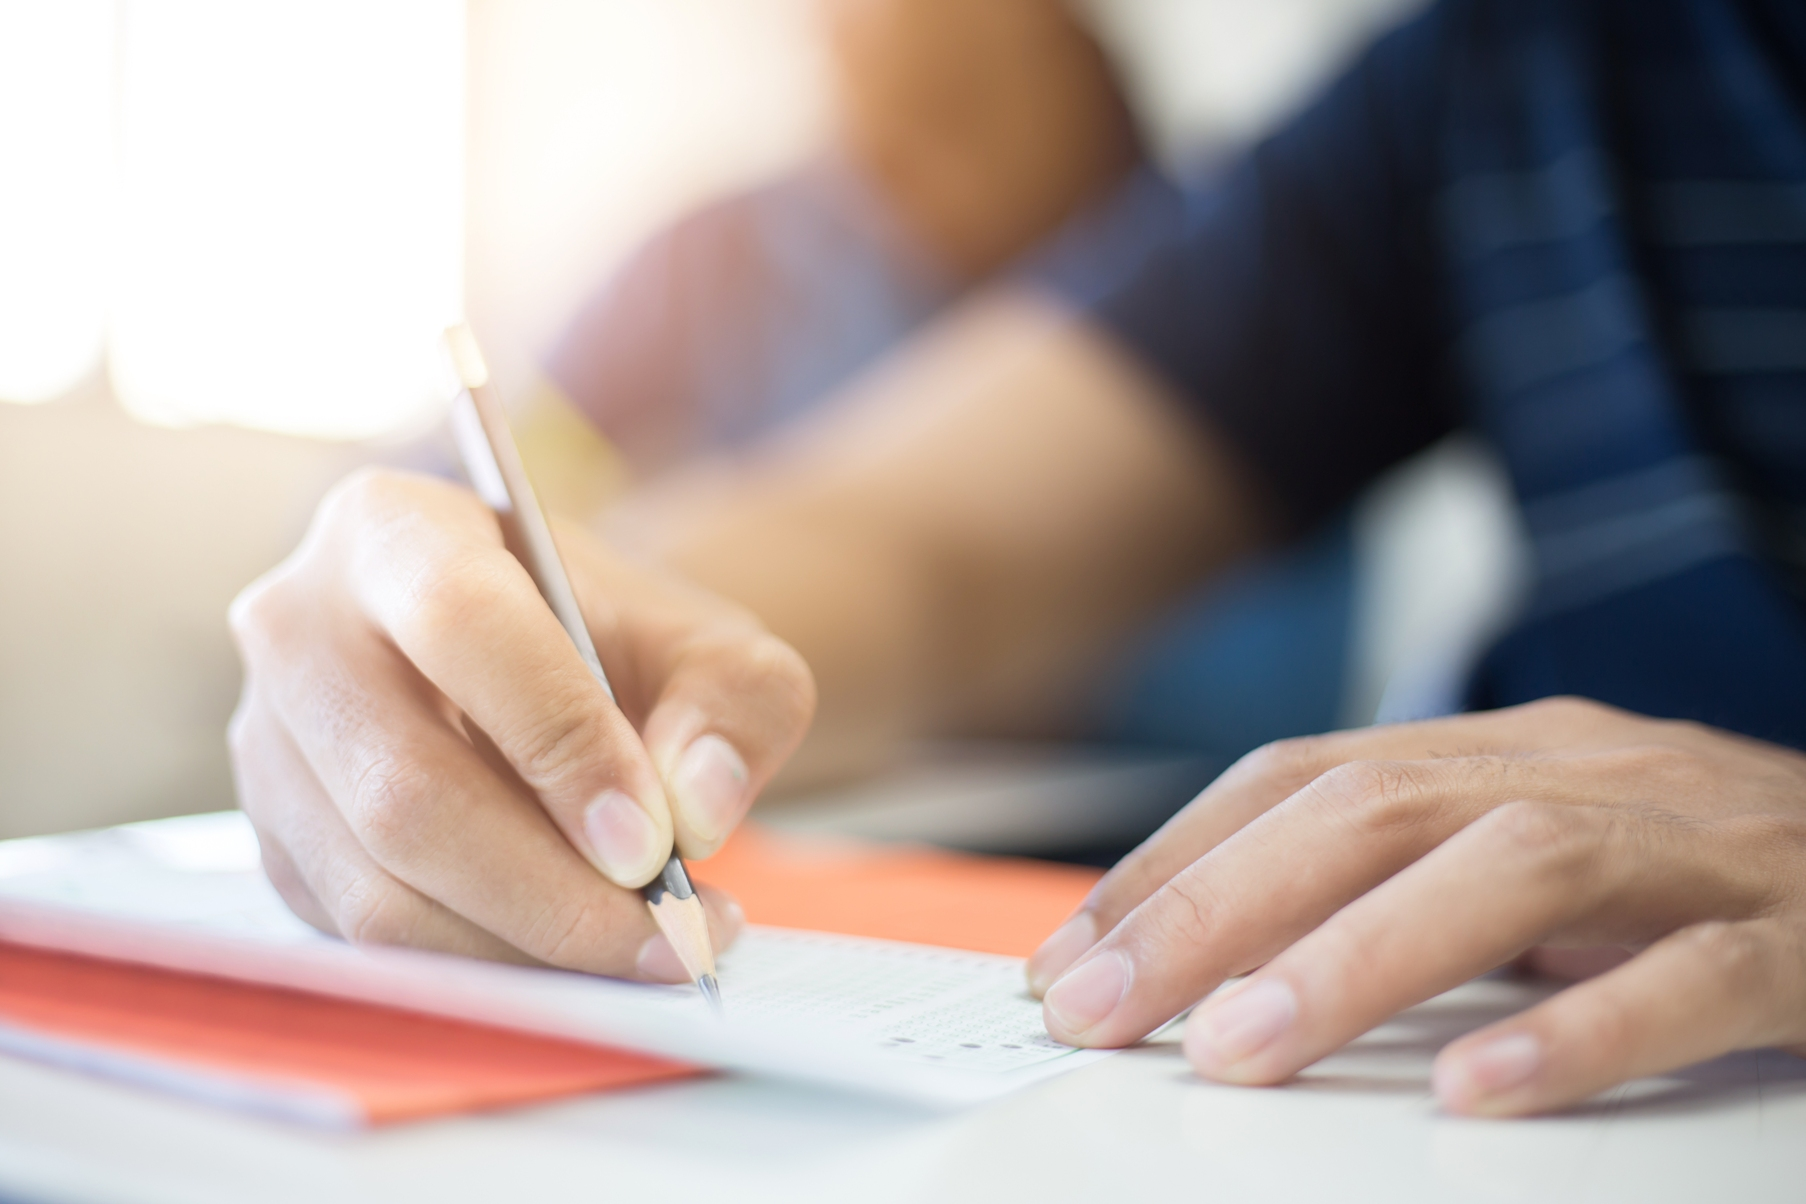 BATIC(国際会計検定)とは?転職に役立つ理由や特徴をご紹介!